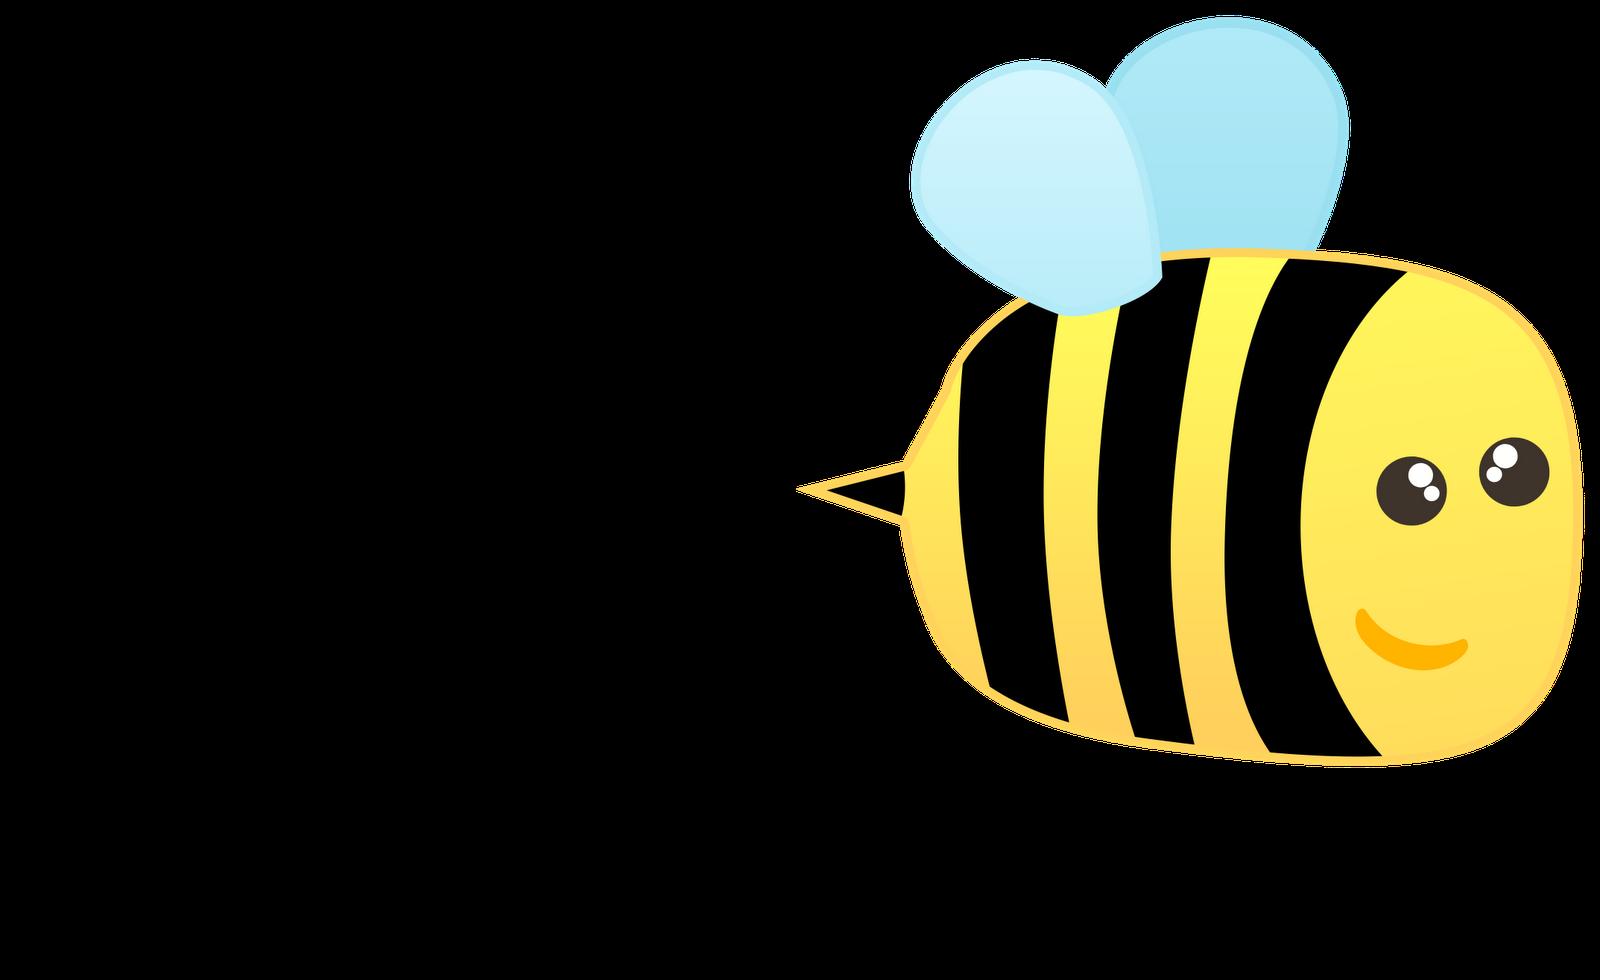 Bumblebee svg #2, Download drawings